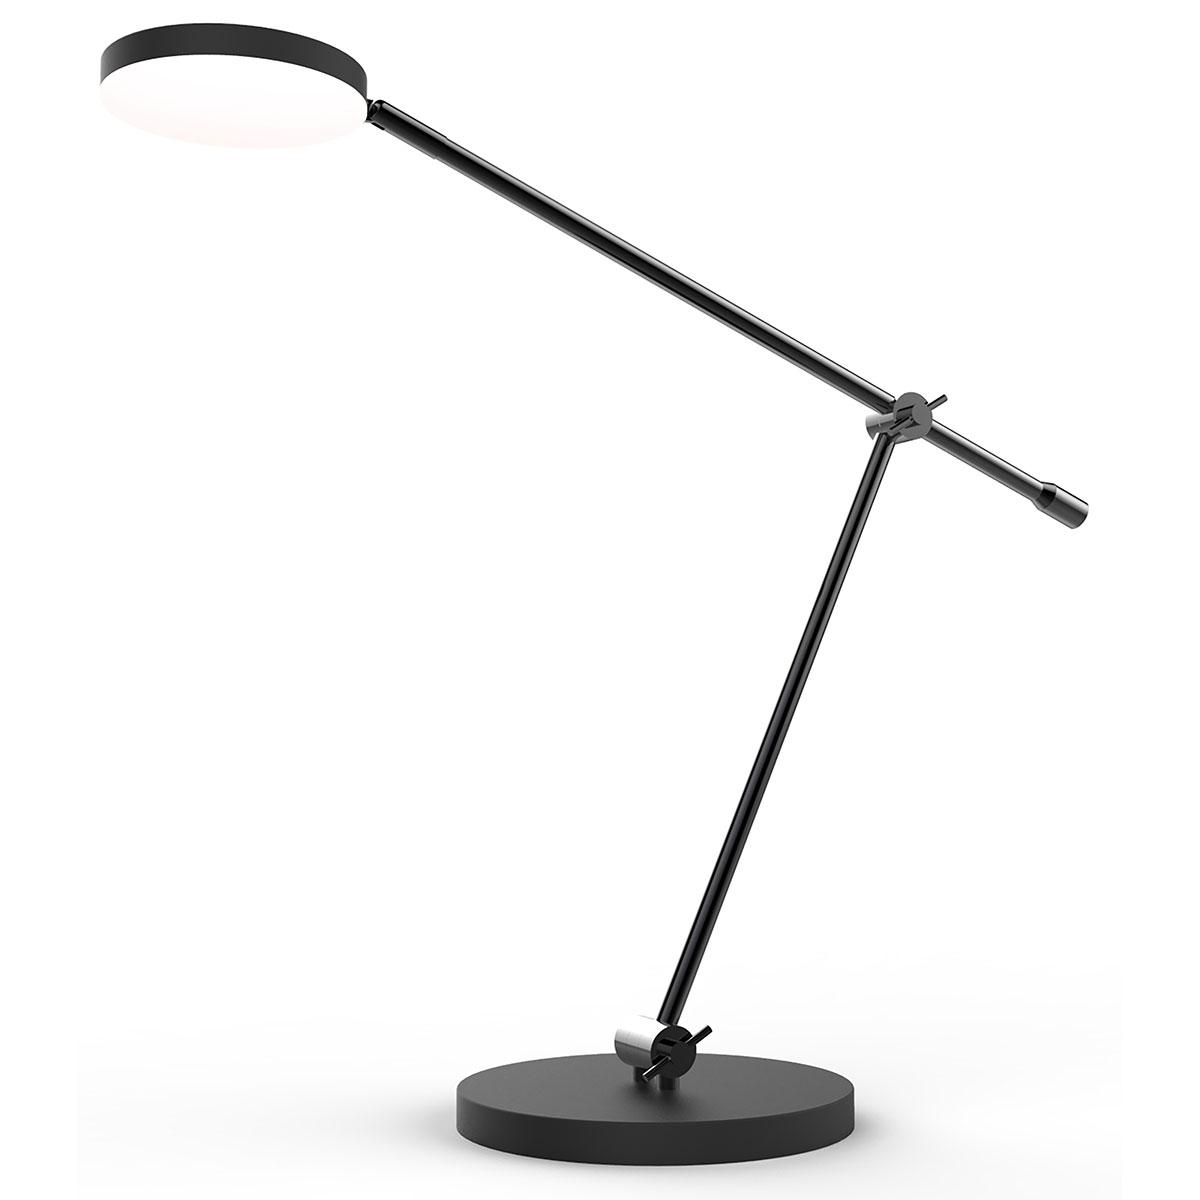 Unilux Sunlight Lampe De Bureau Unilux Sur Ldlc Com